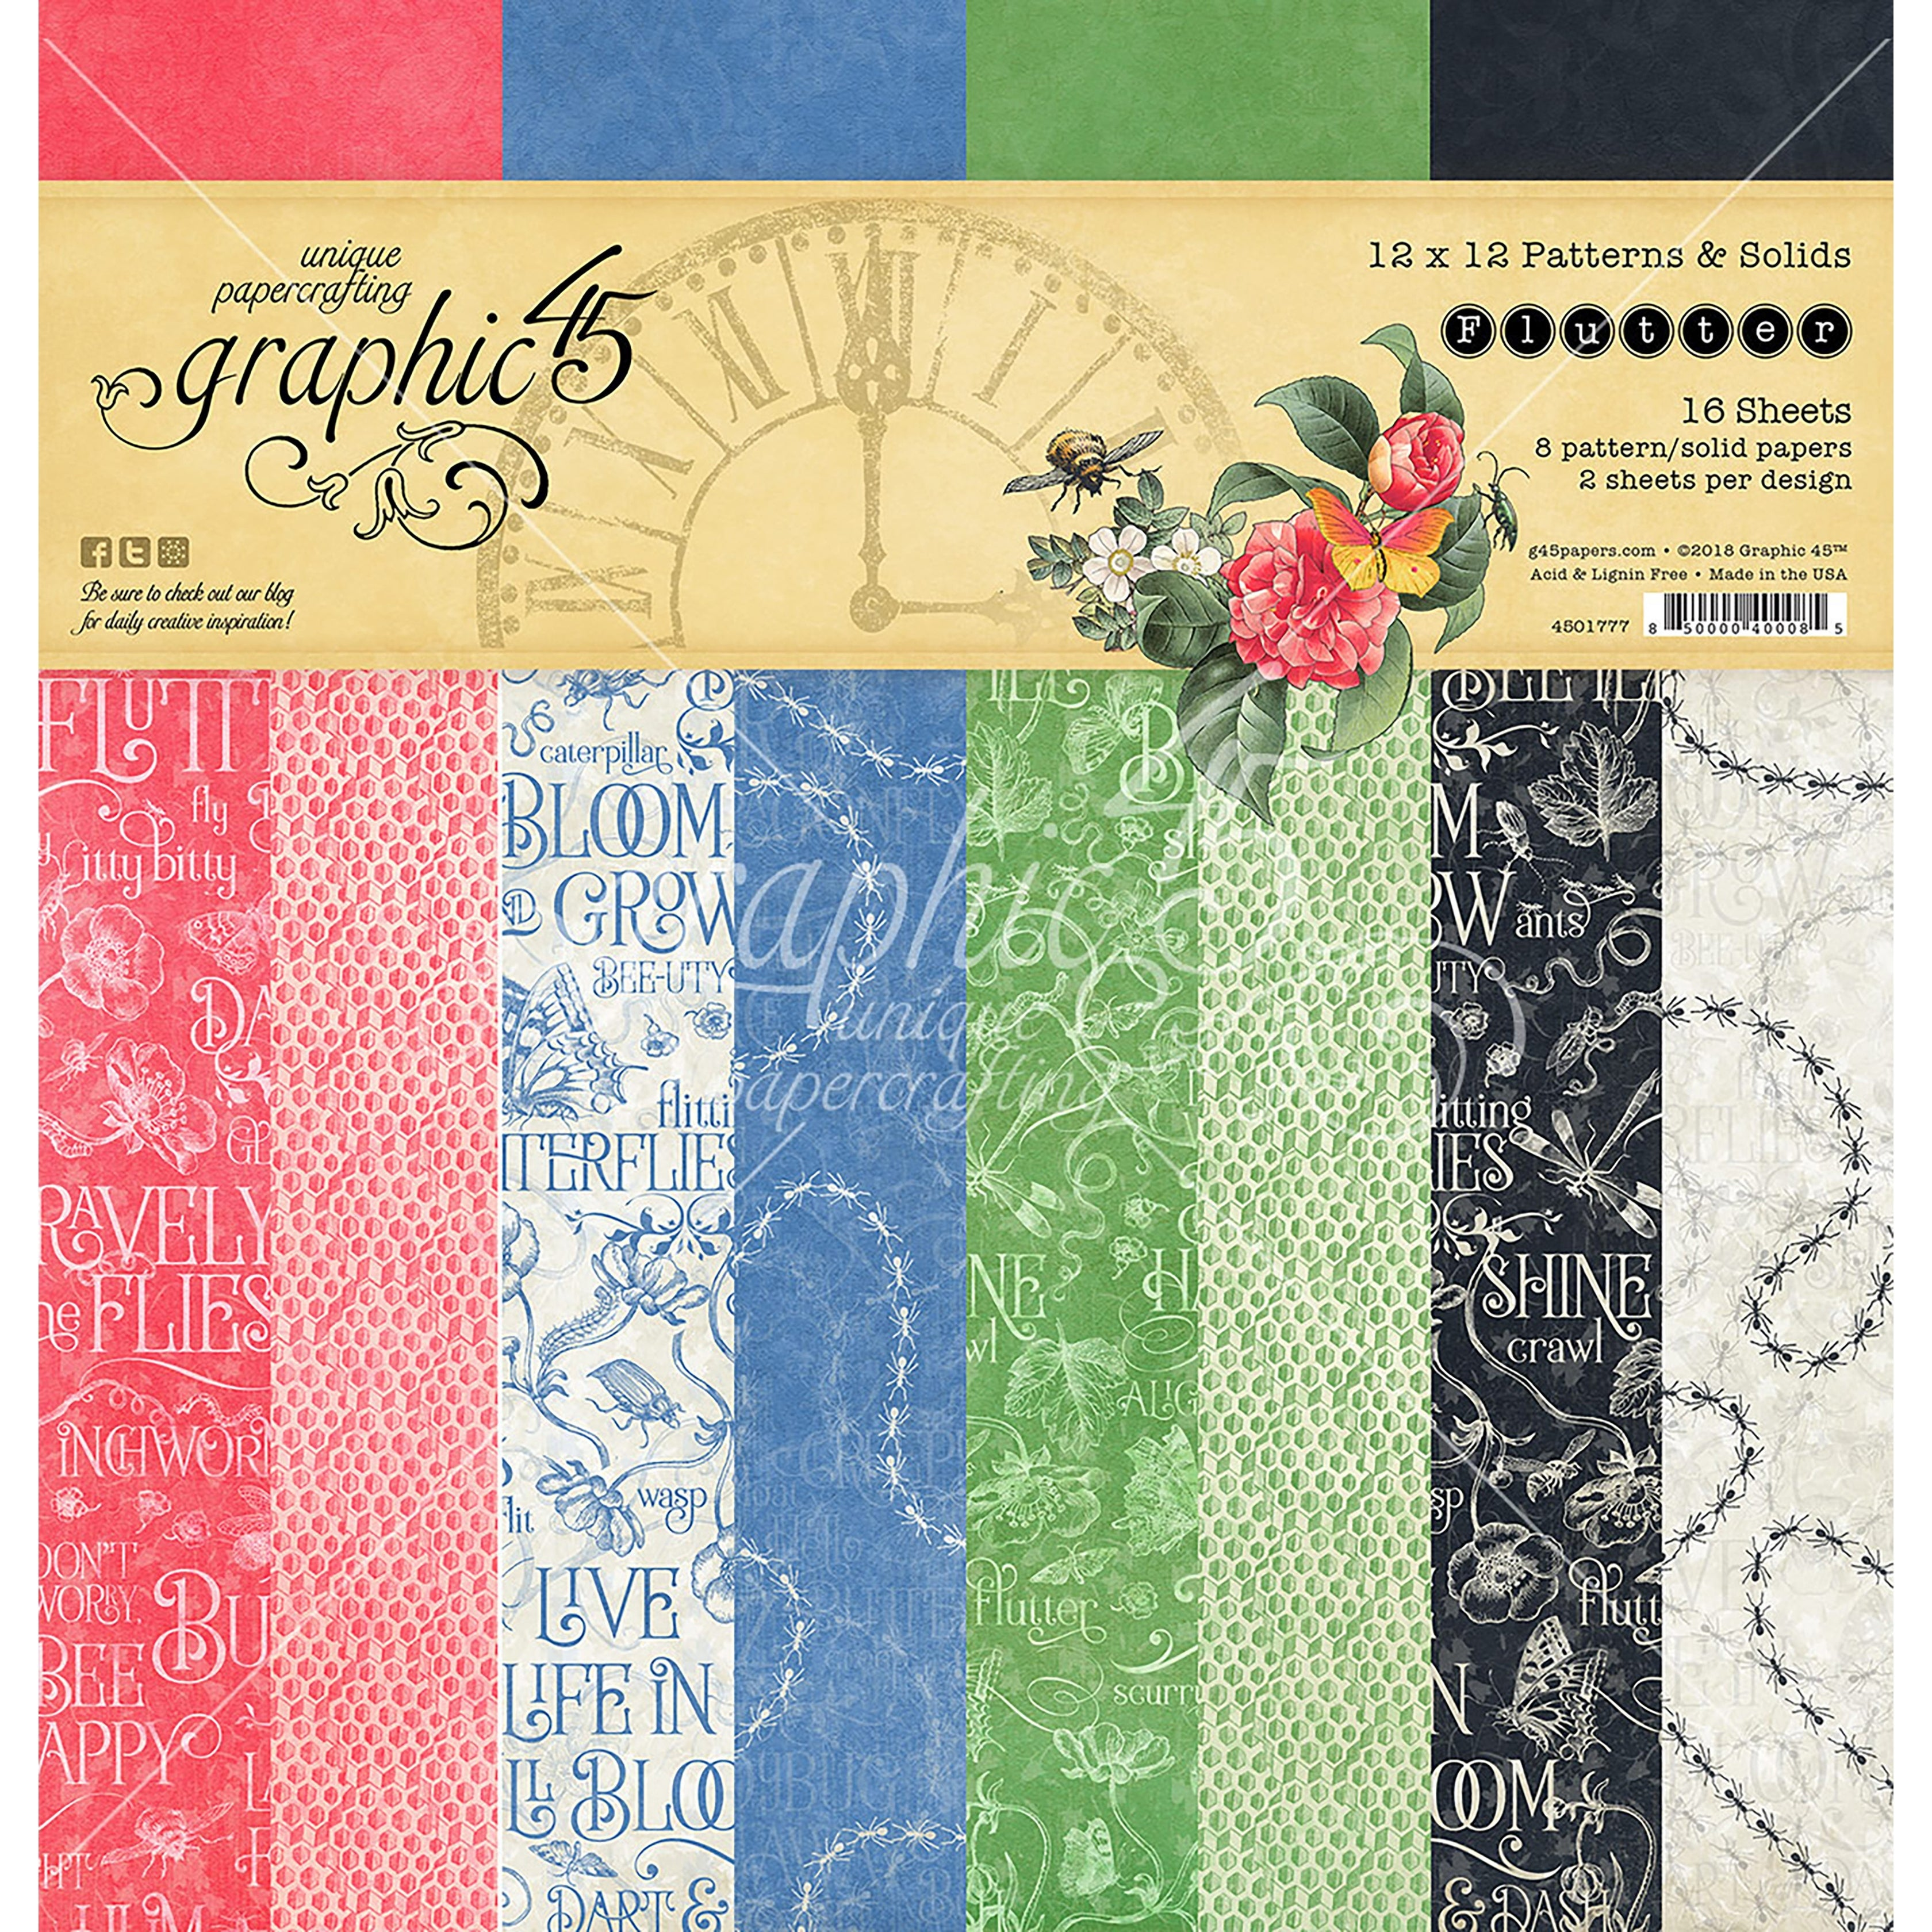 4ebc3a0535a1d Graphic 45 Scrapbooking | Shop our Best Crafts & Sewing Deals Online ...